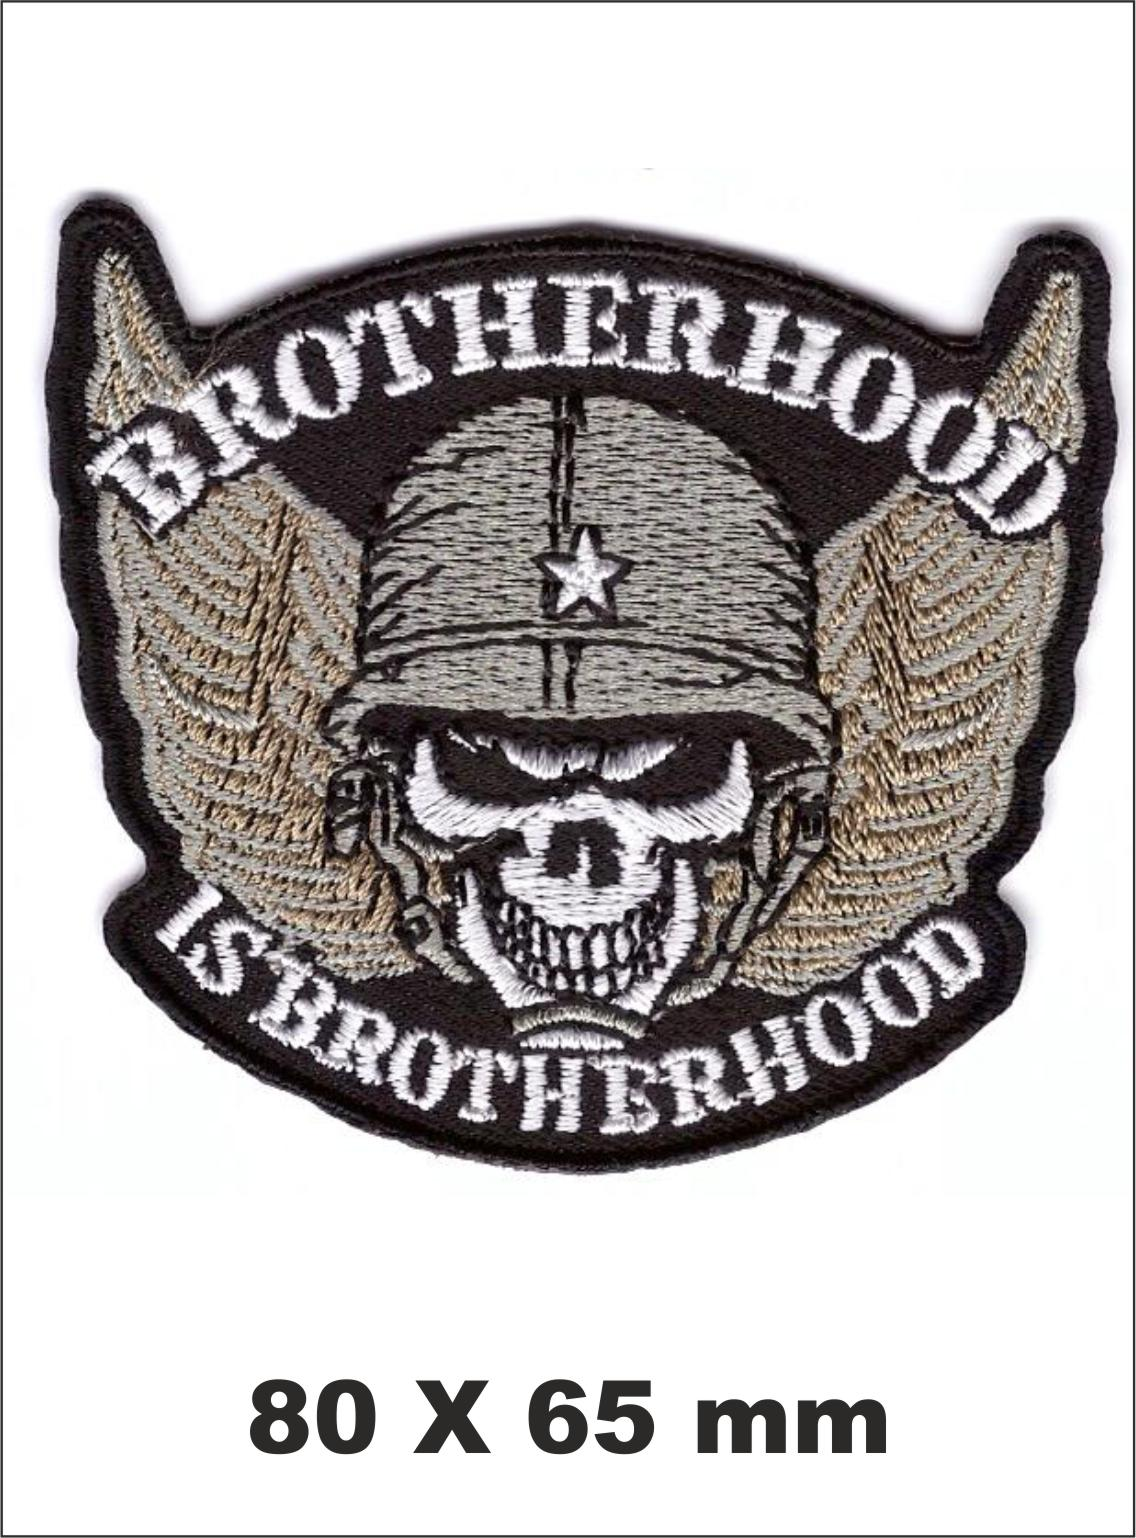 PARCHE BORDADO BROTHERHOOD